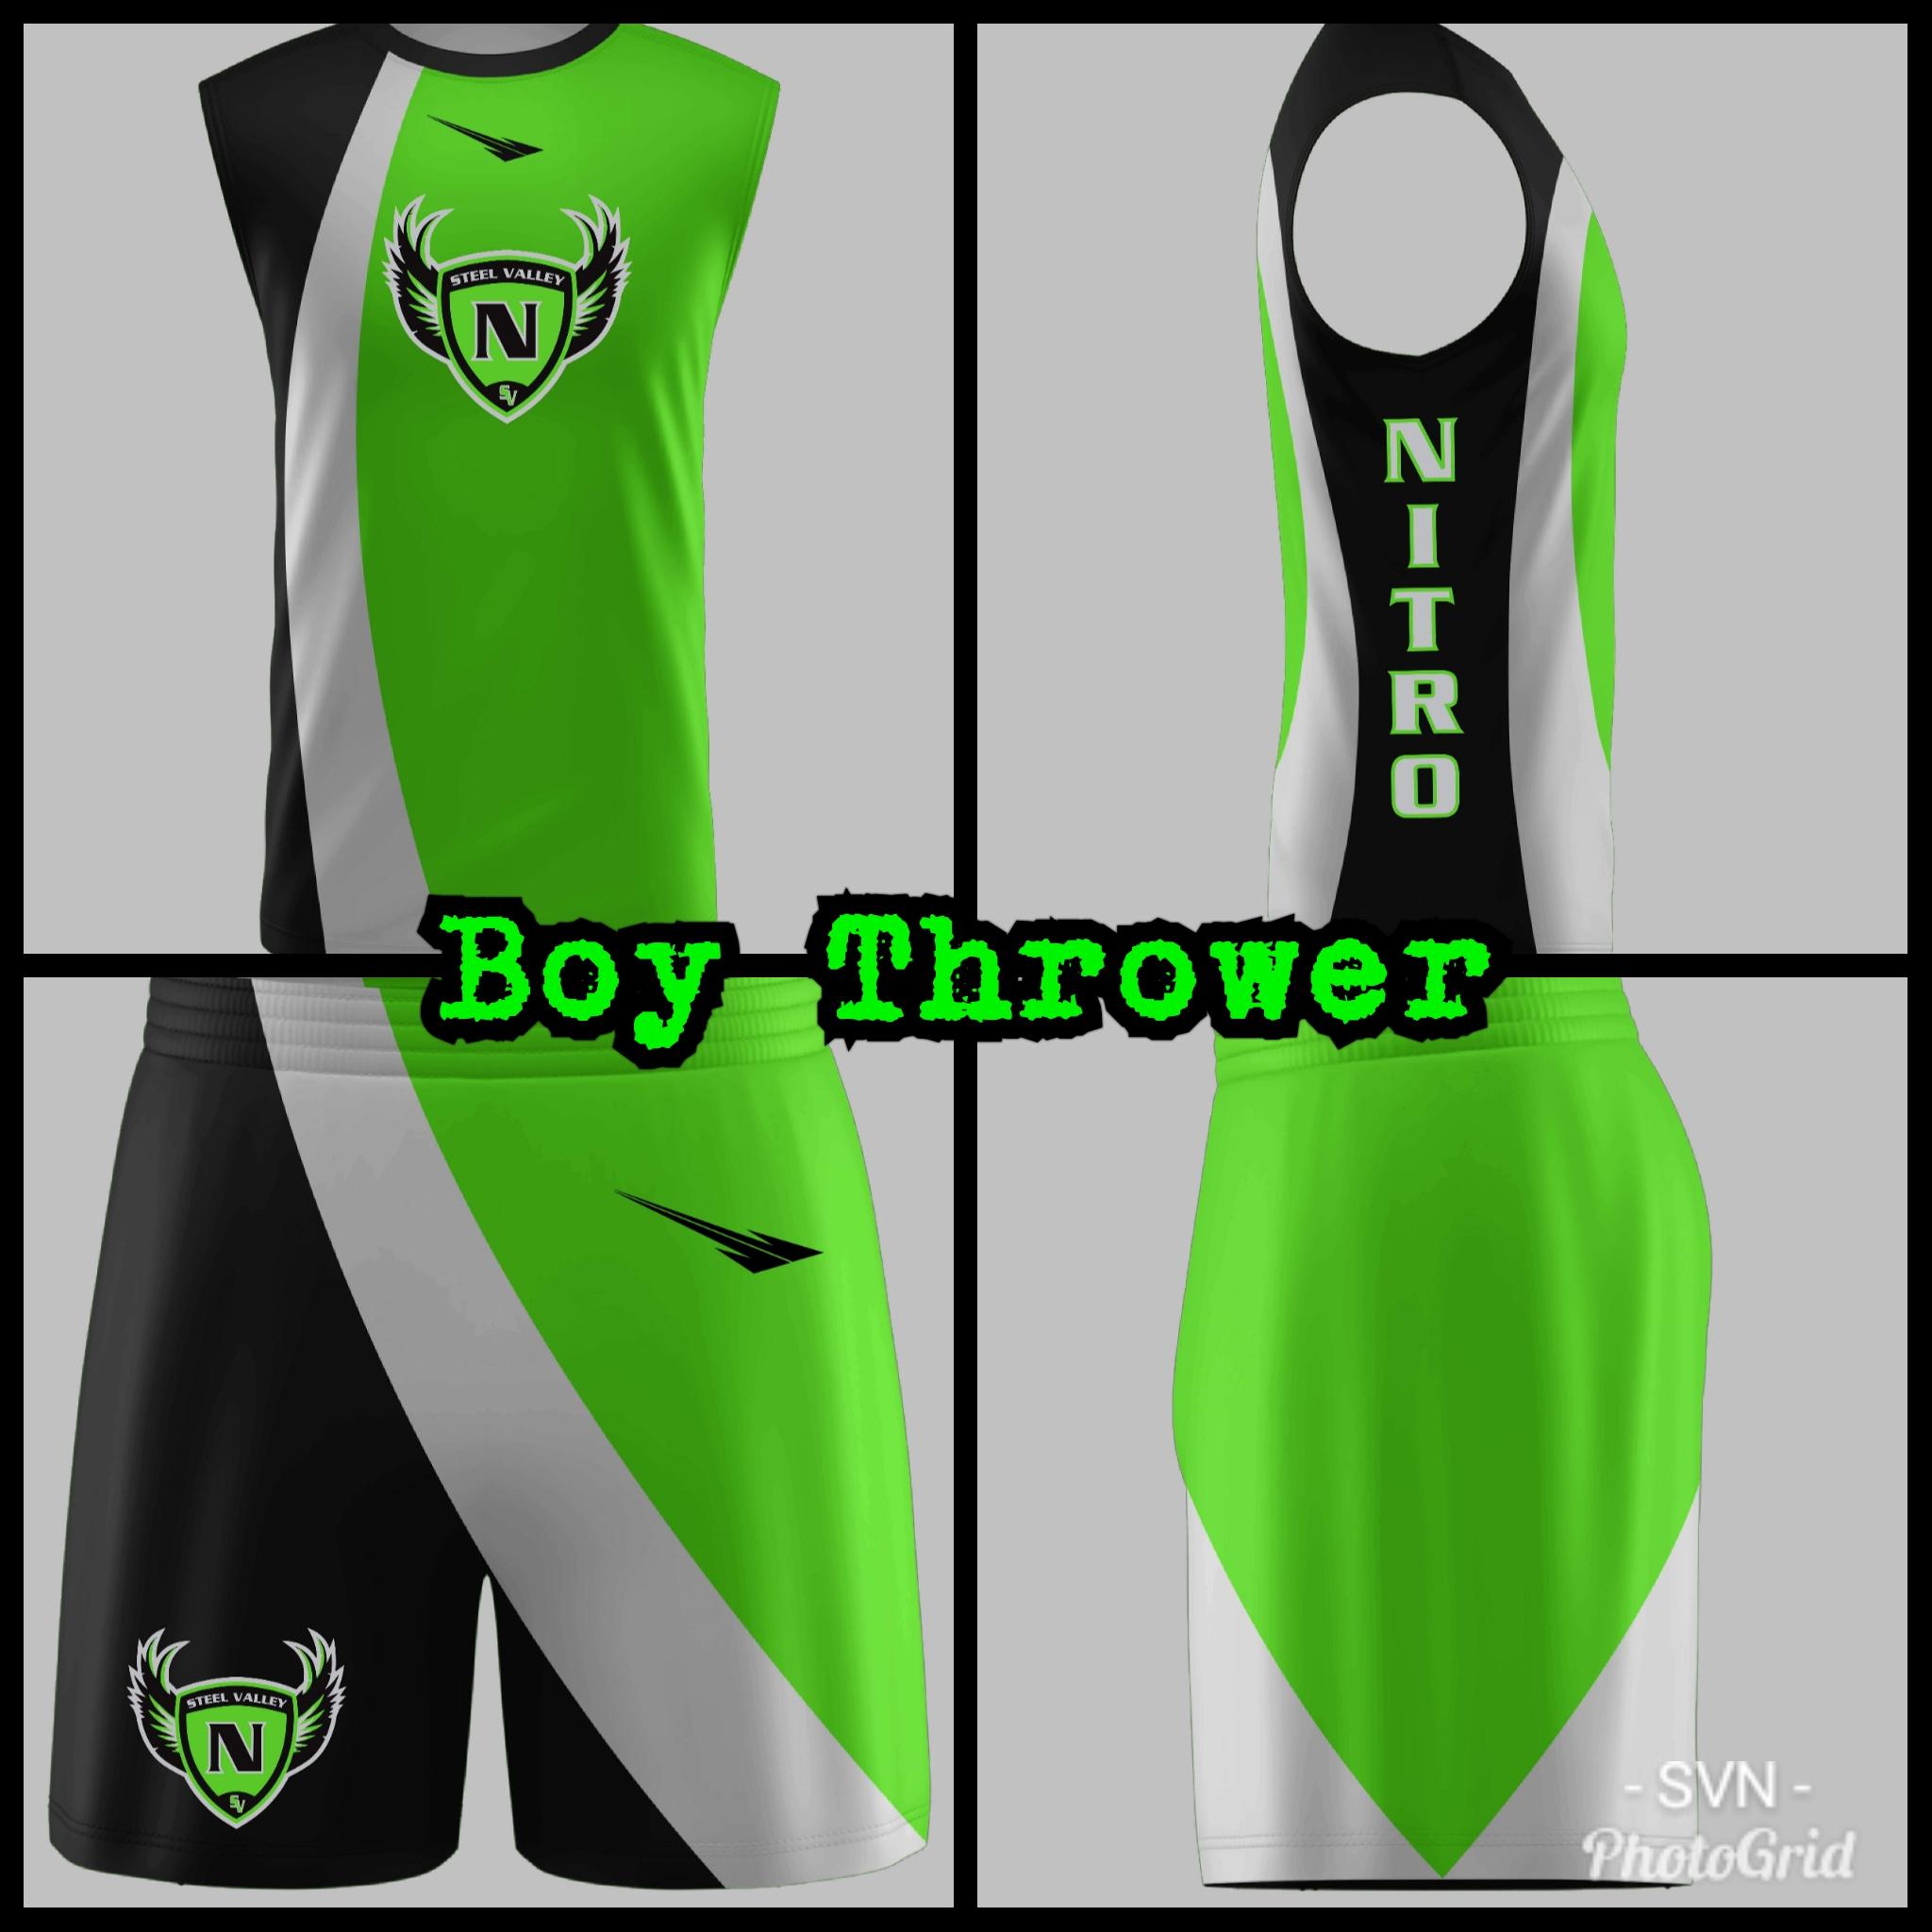 boy thrower.jpg